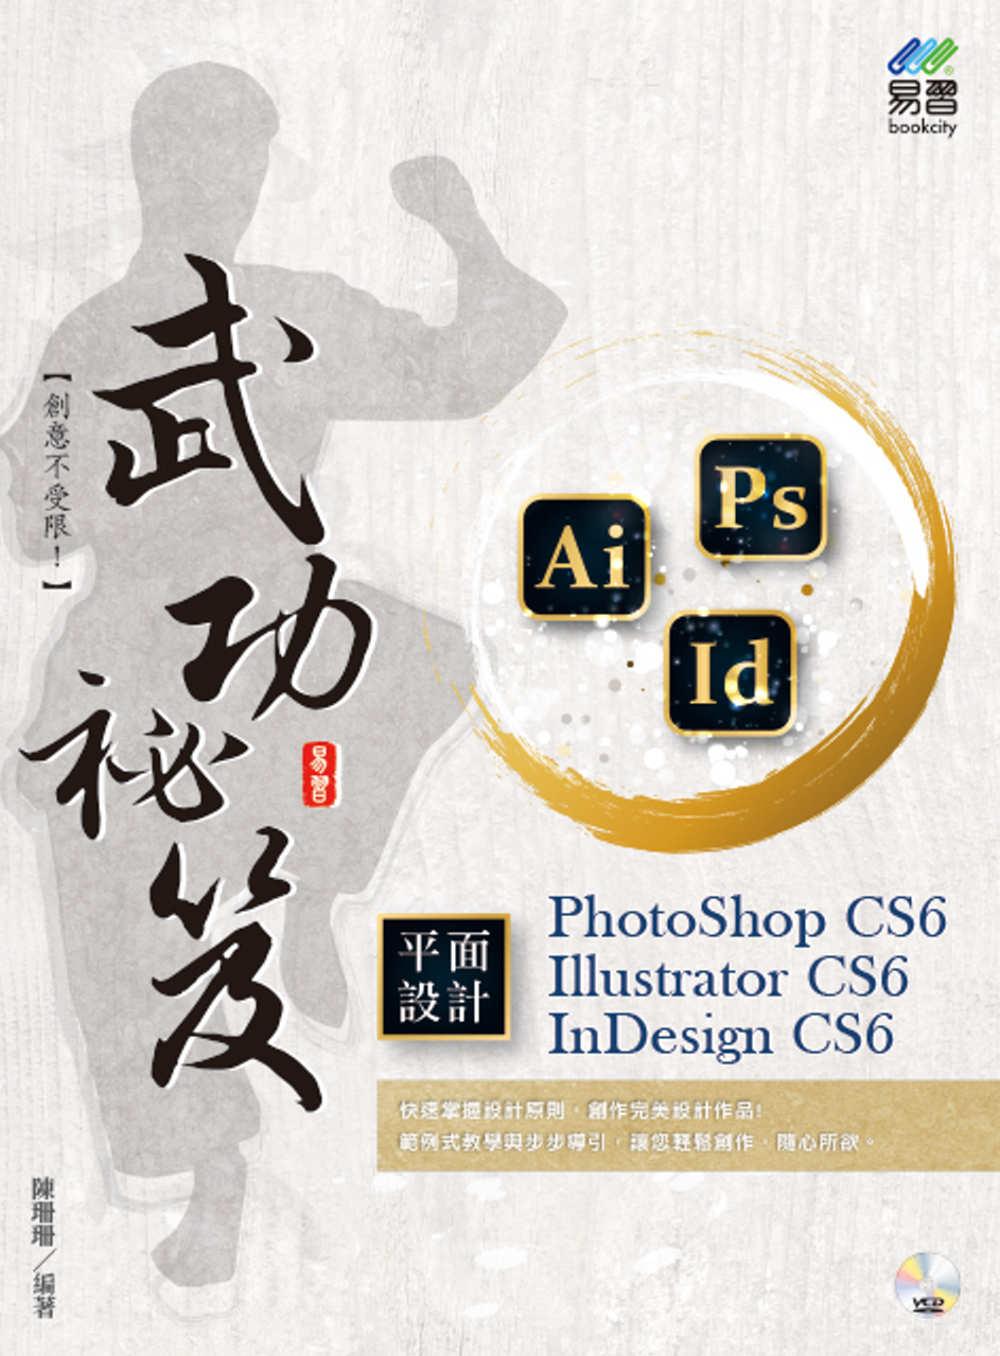 PhotoShop CS6、I...